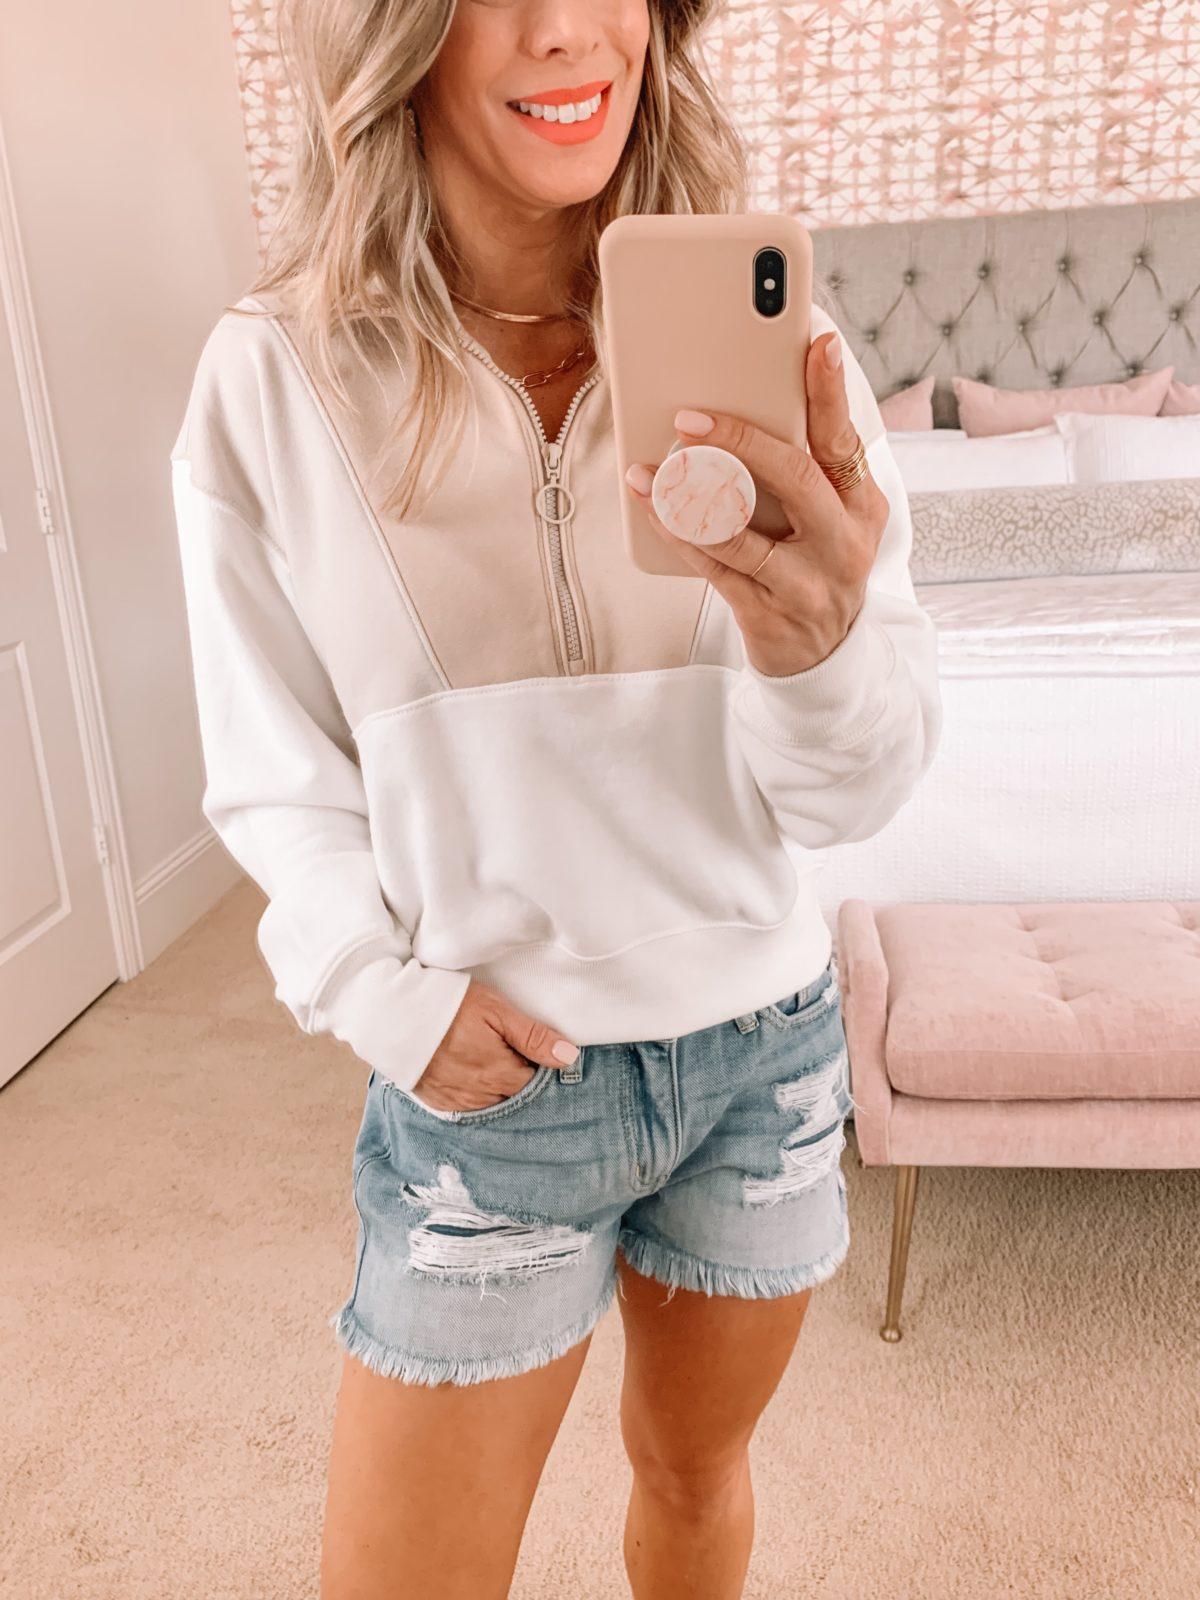 Dressing Room Finds, Nordstrom, Abercrombie, Shorts, Pullover, Sandals